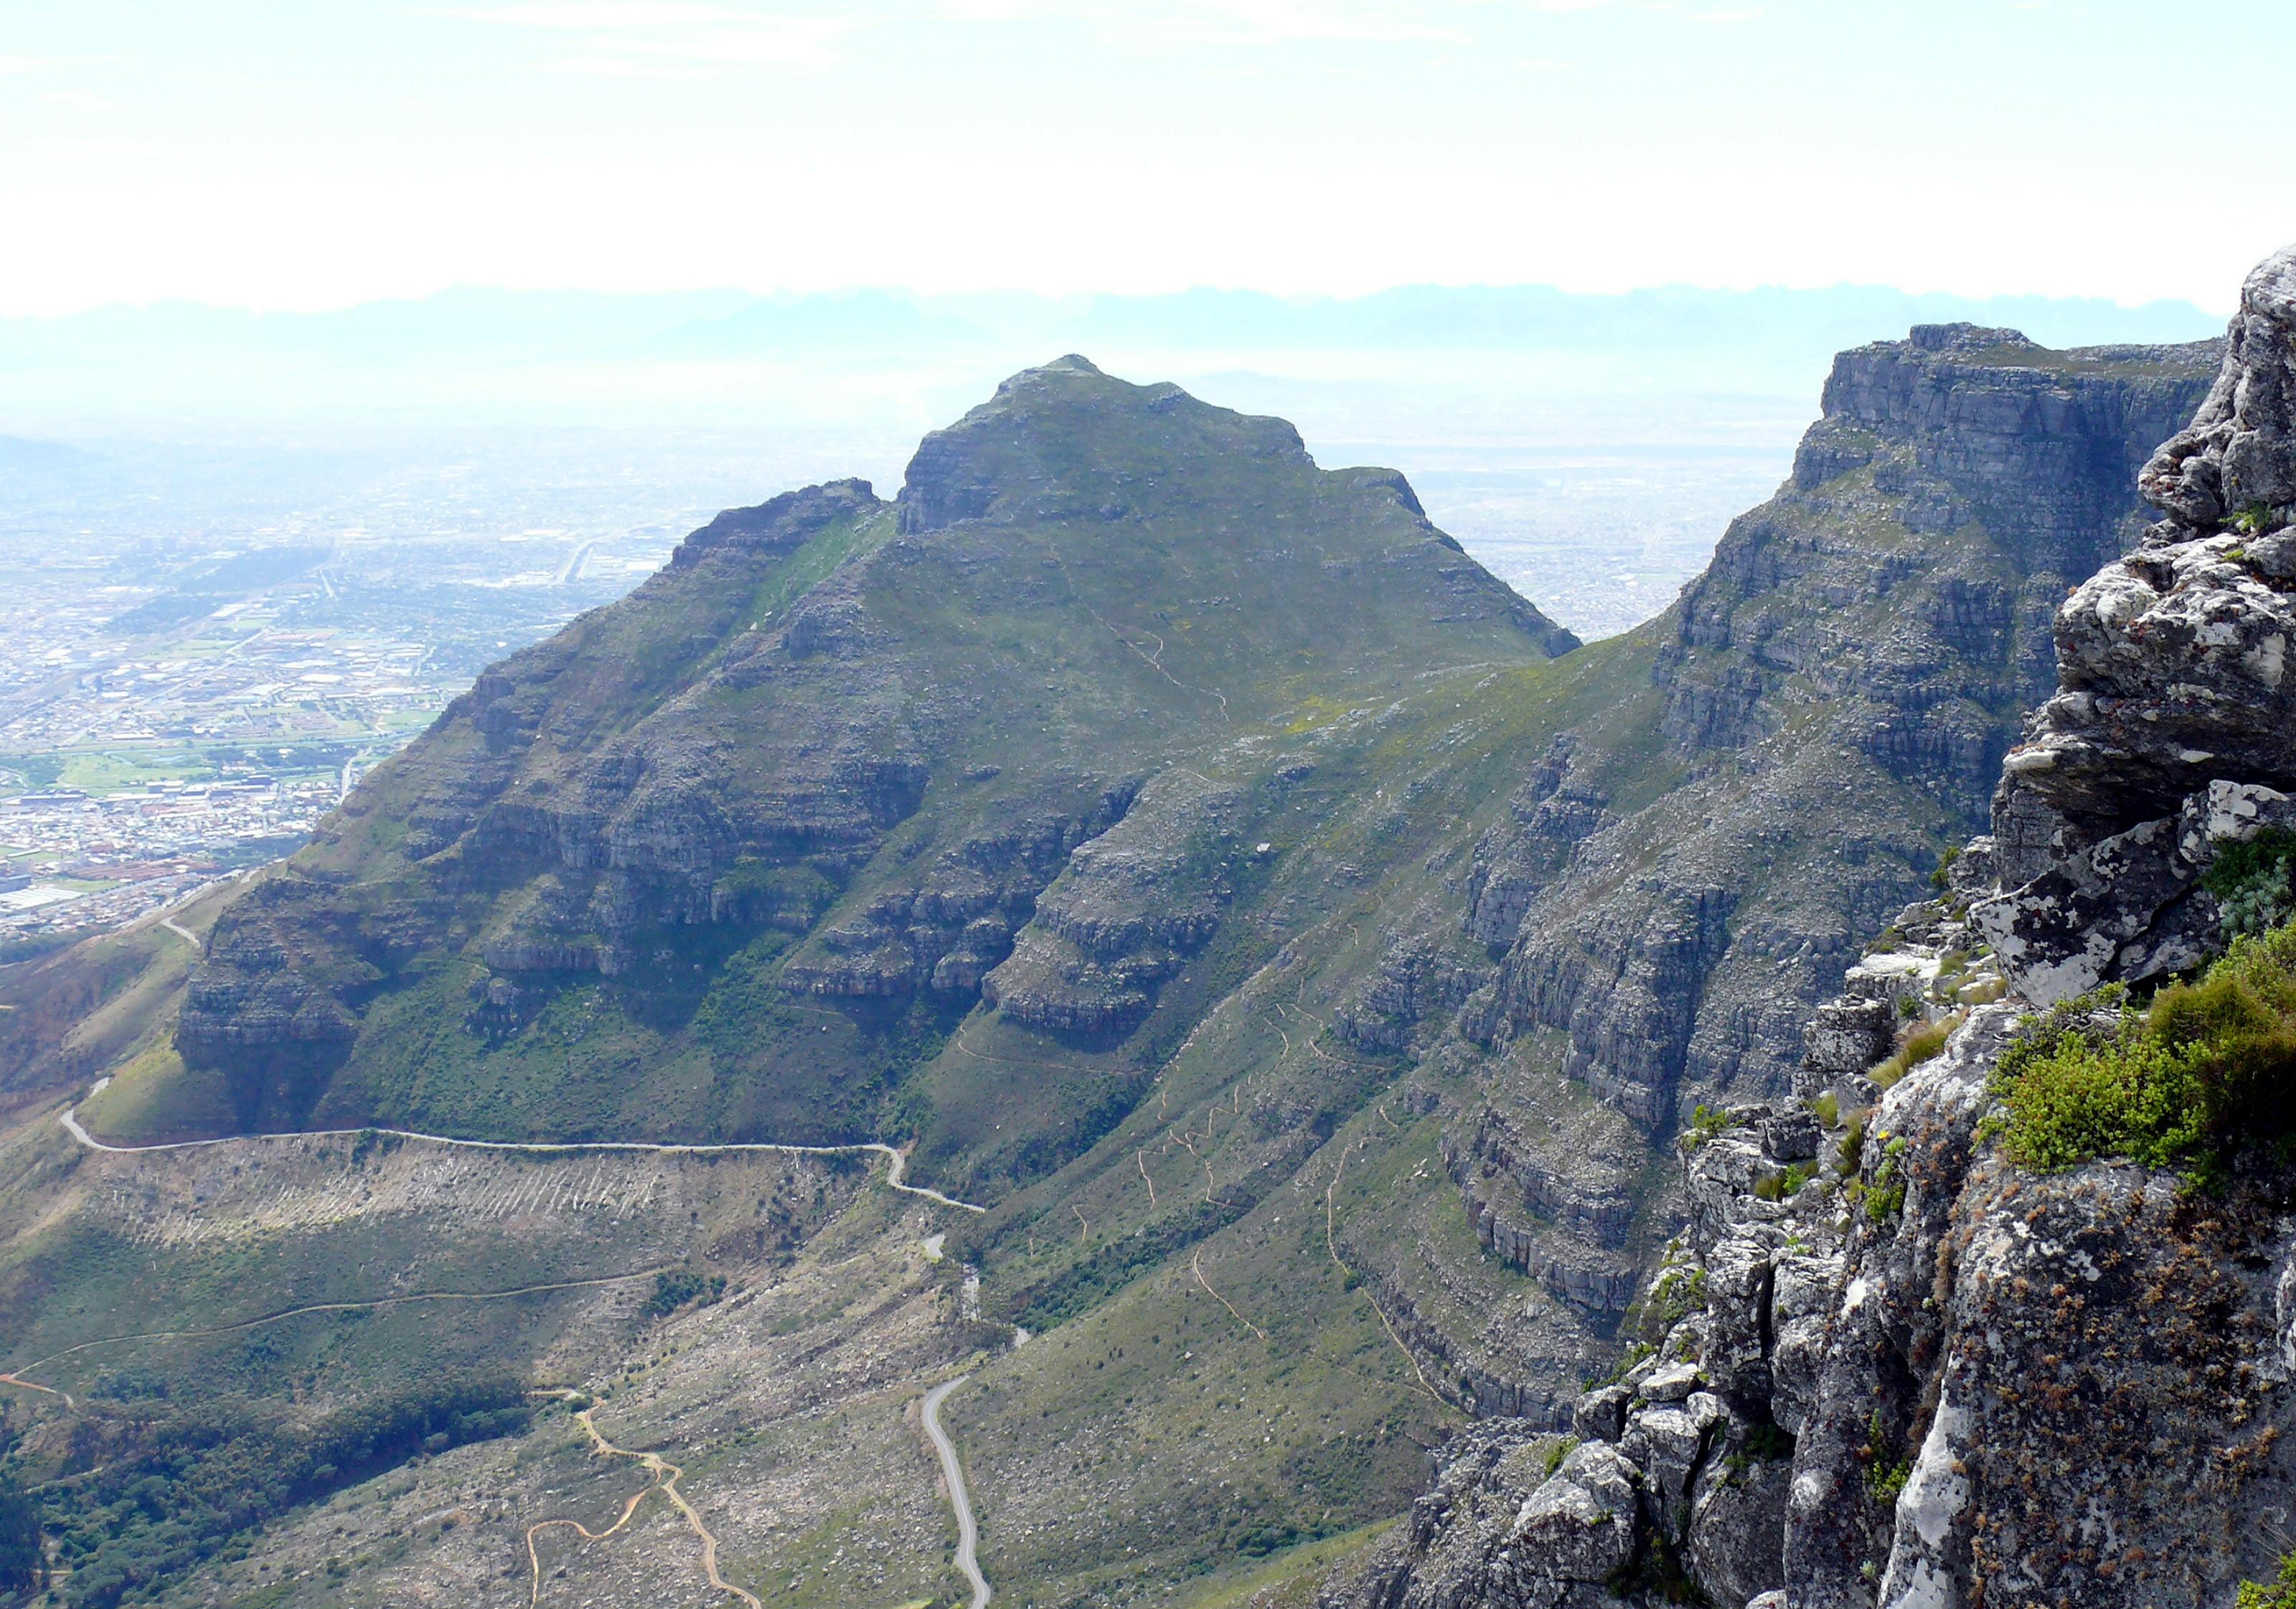 Devilu0027s Peak as viewed from the Summit